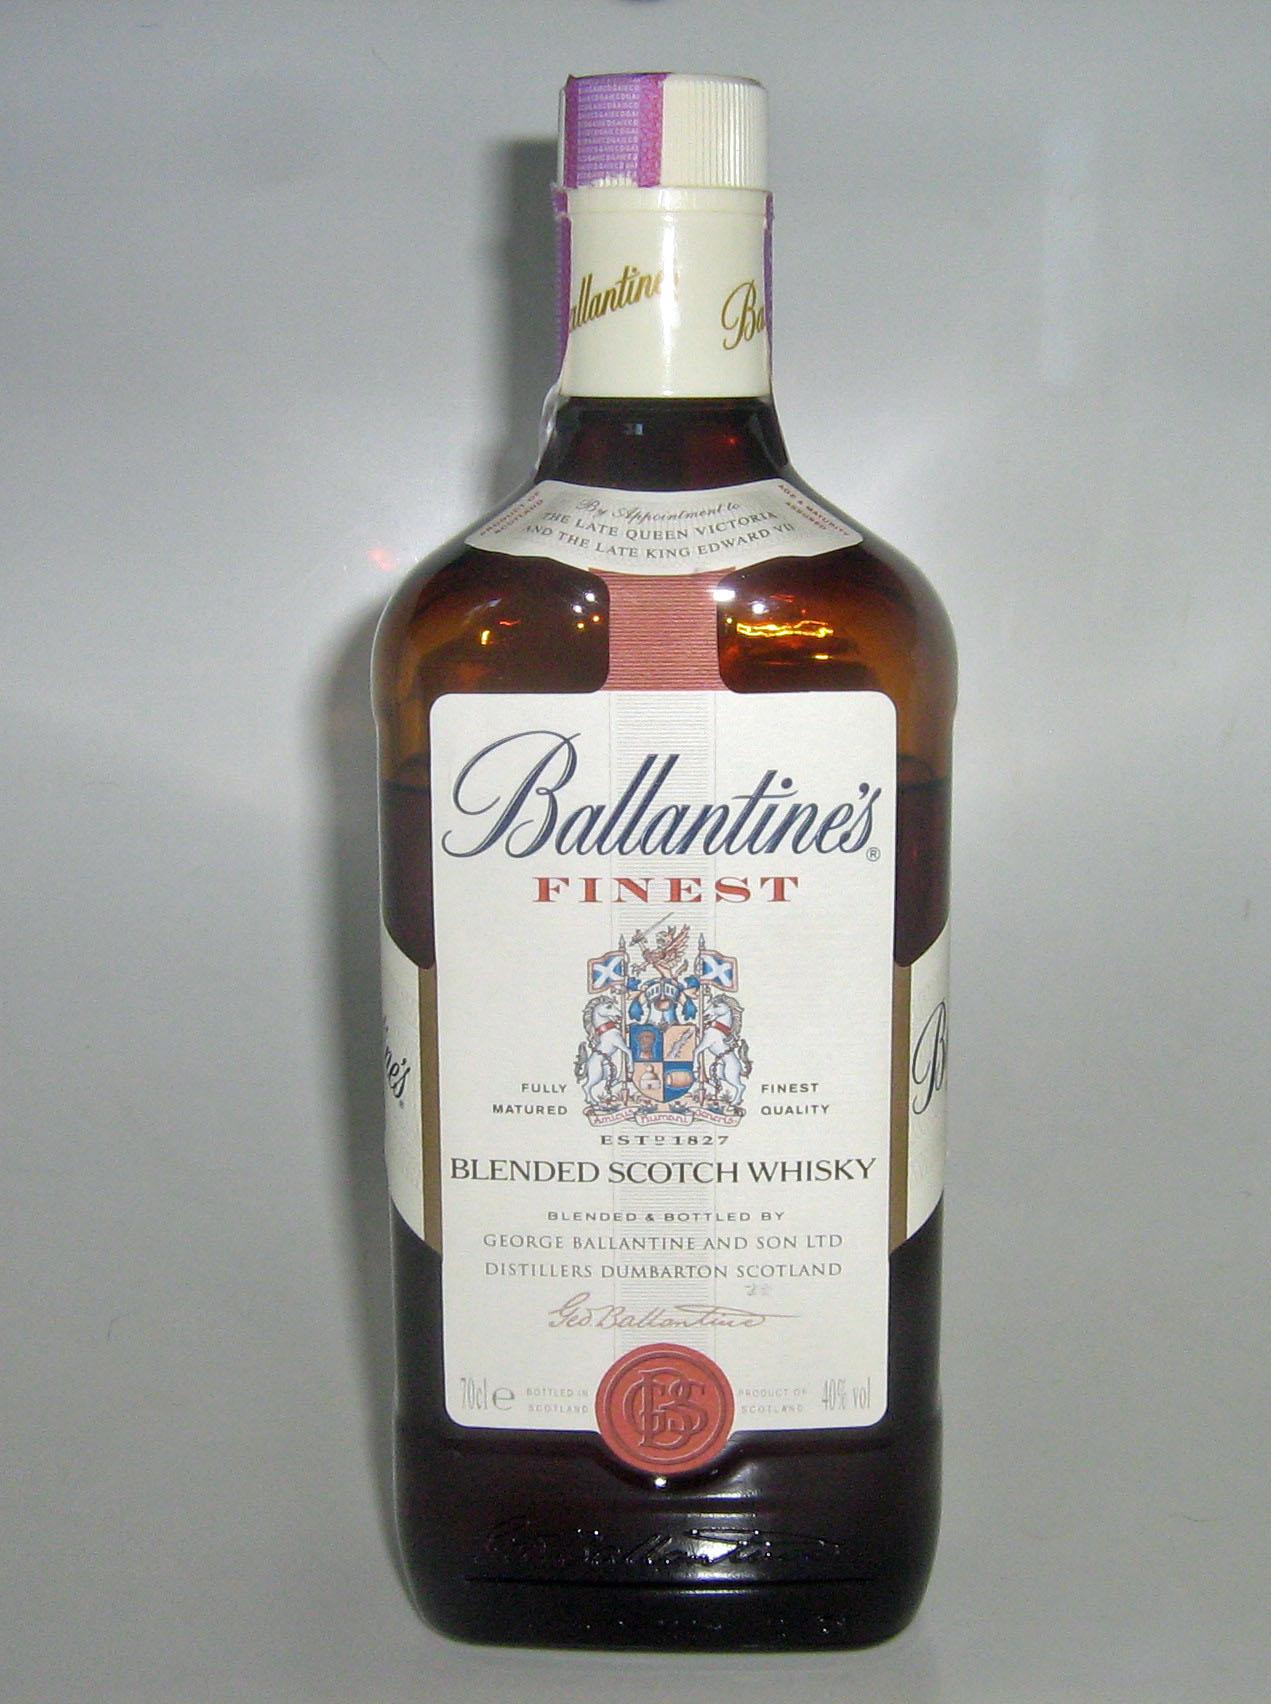 Ballantineu0027s Finest Blended Scotch Whiskey